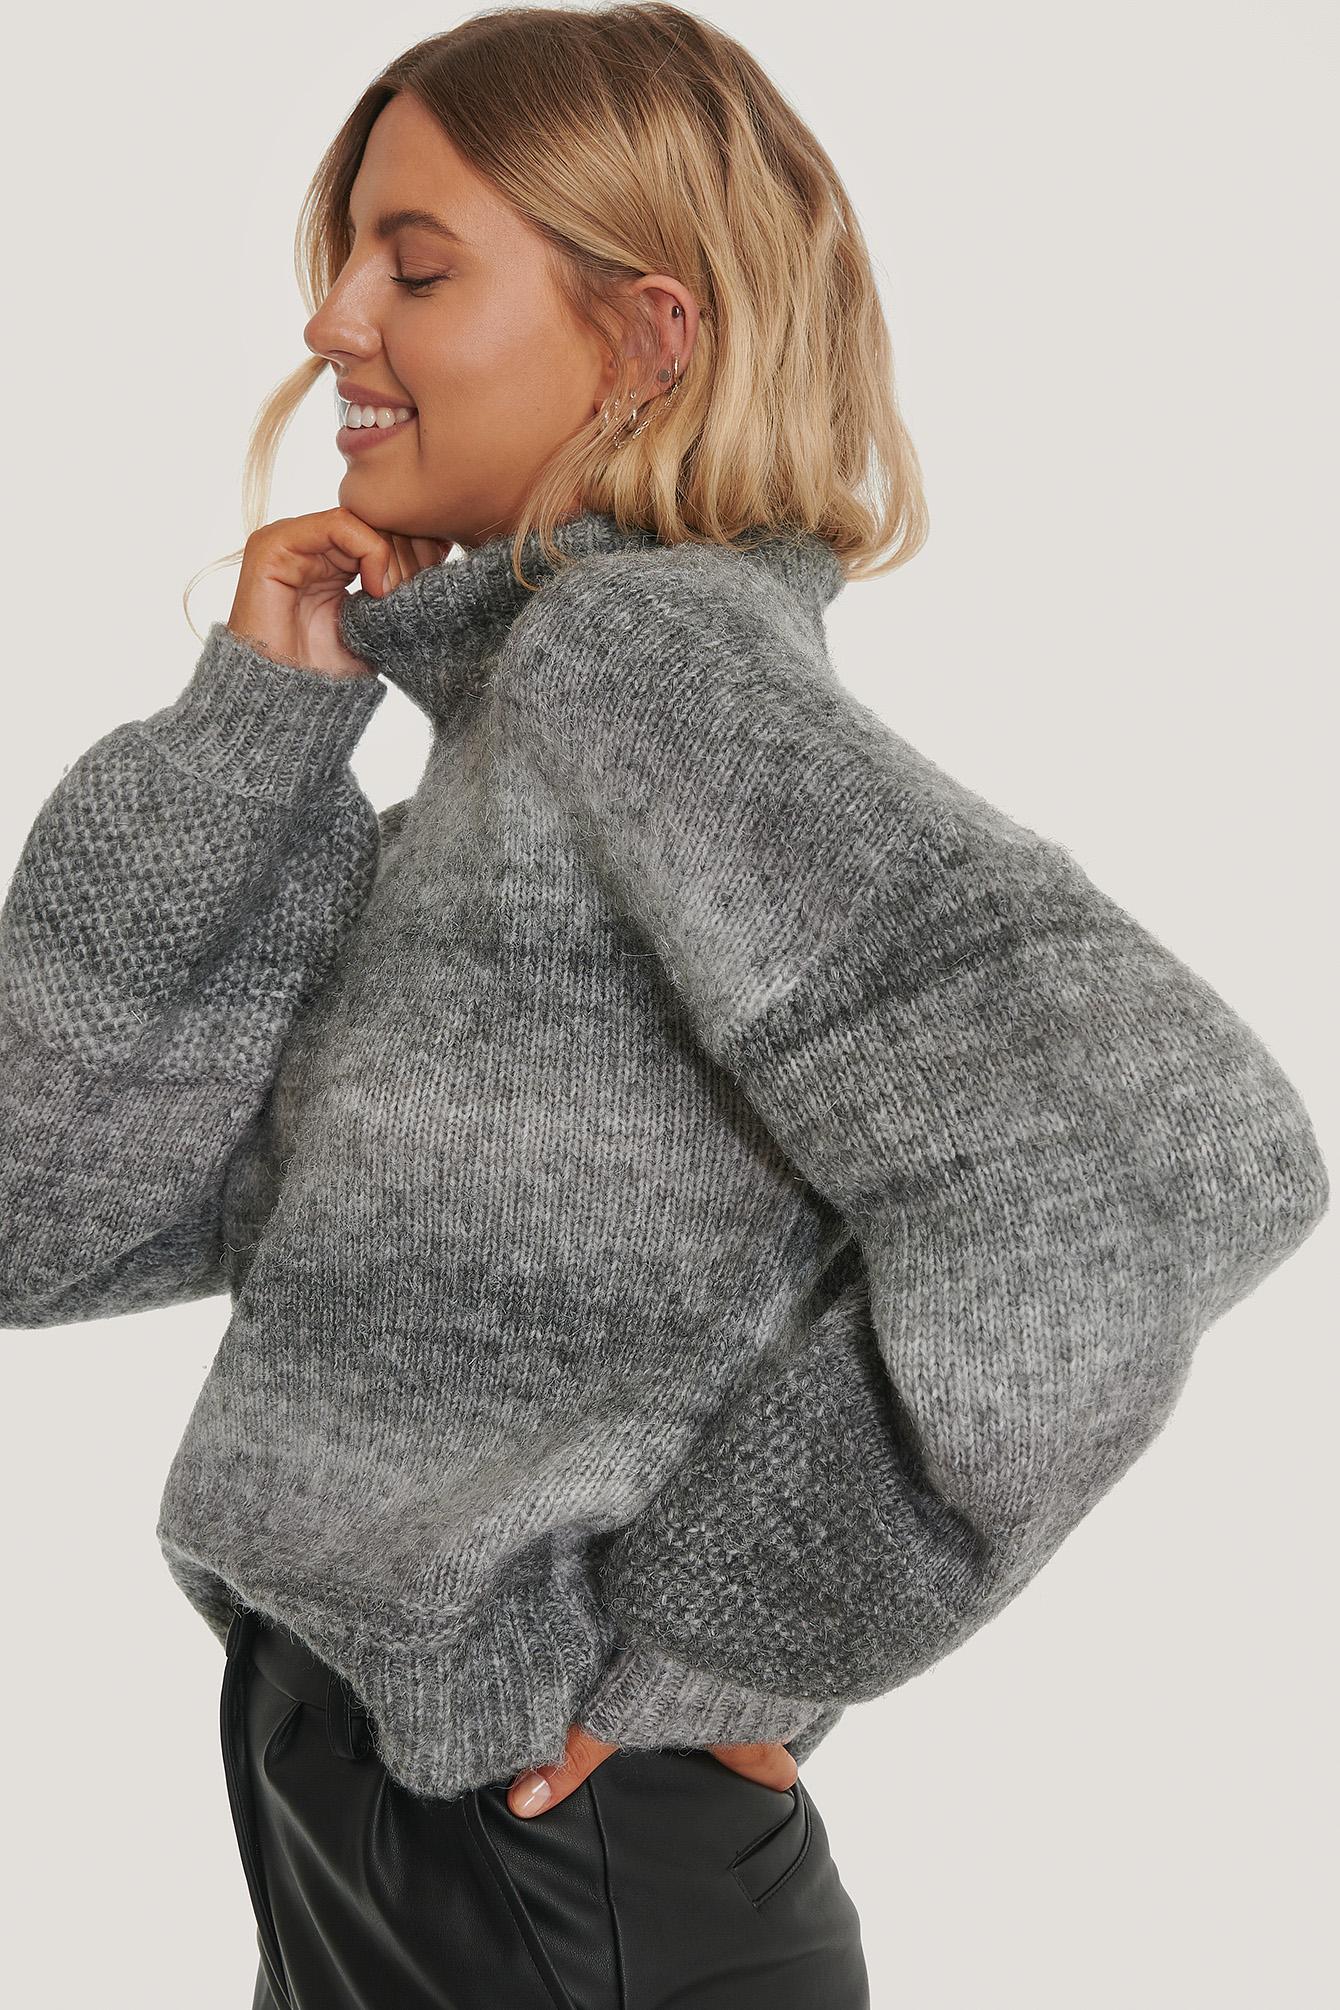 na-kd -  Verblasster Farbiger Strickpullover - Grey